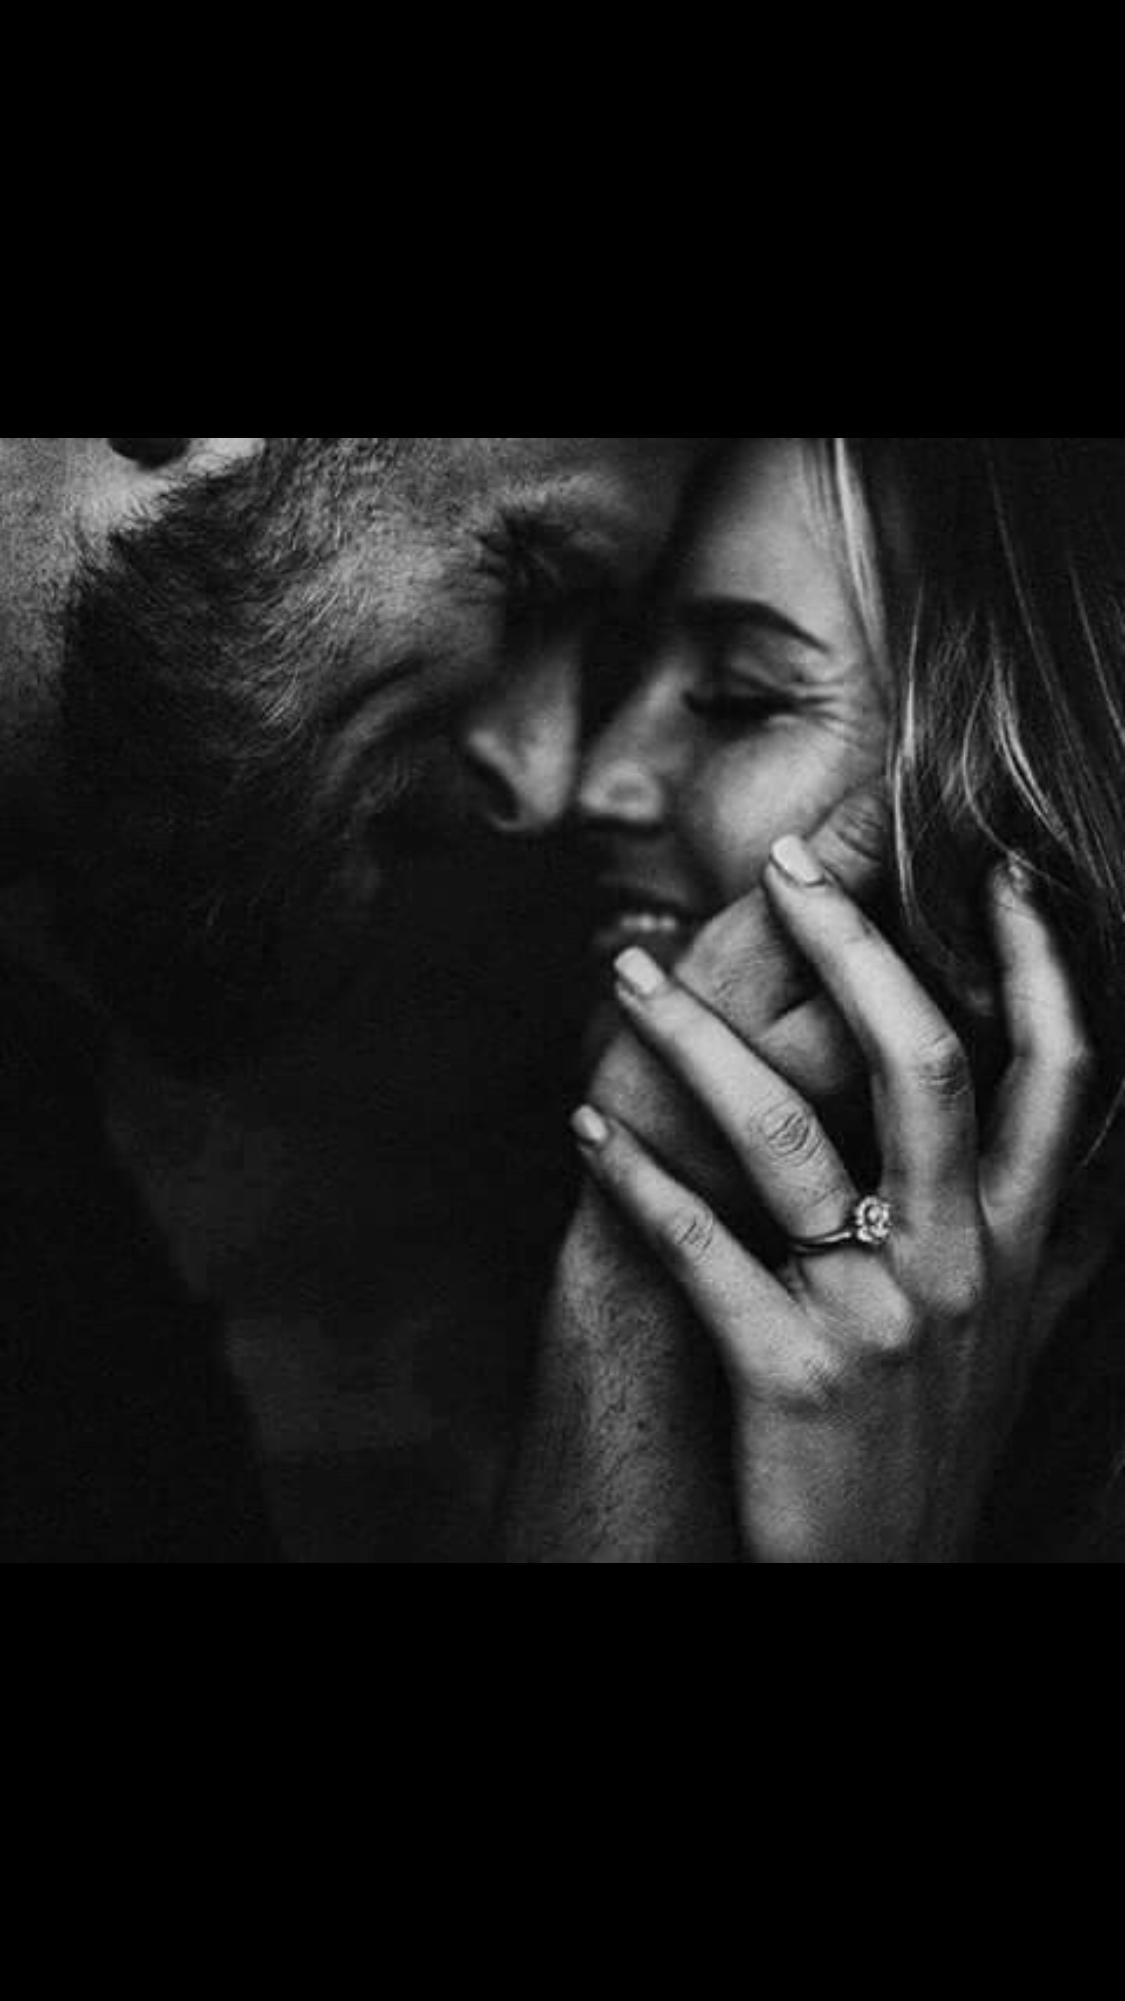 Couple Photography l Engagement Photoshoot